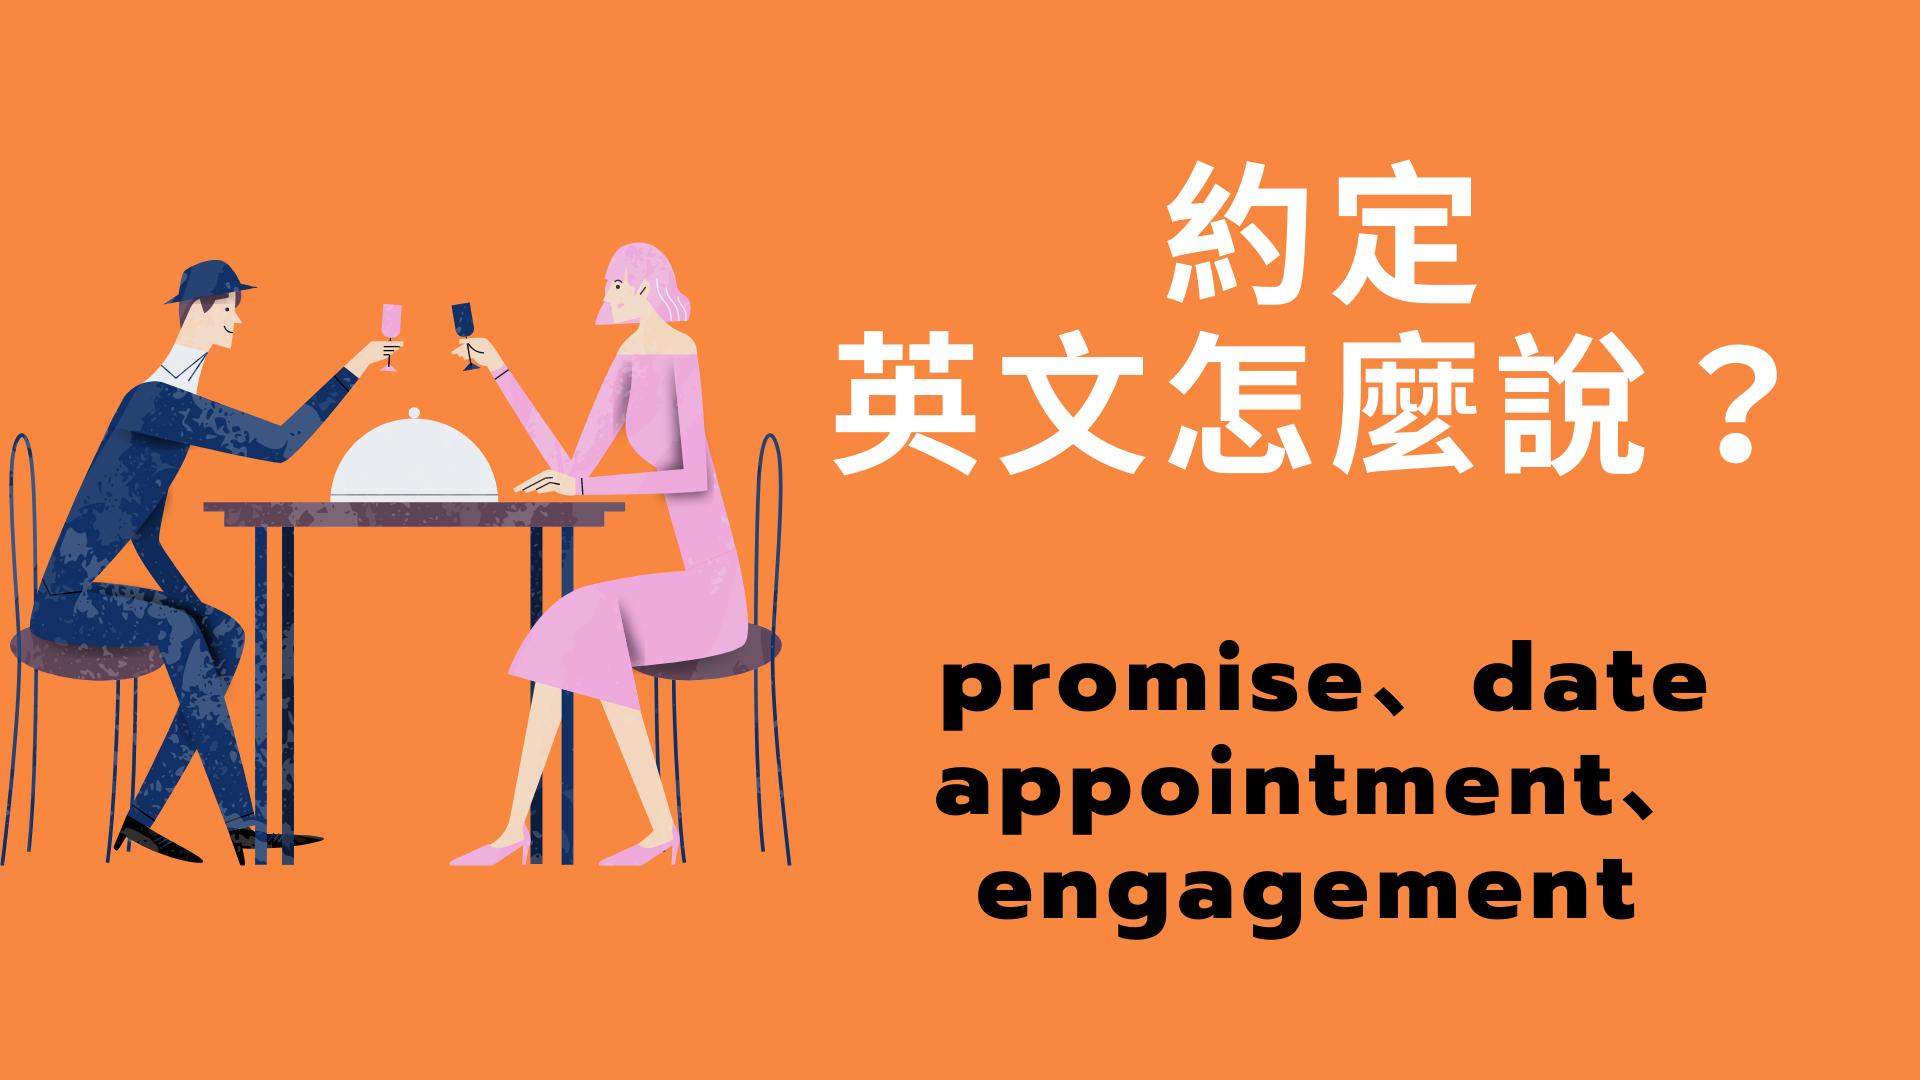 「約定」英文怎麼說?promise/ date/ appointment/ engagement 中文意思一次搞懂